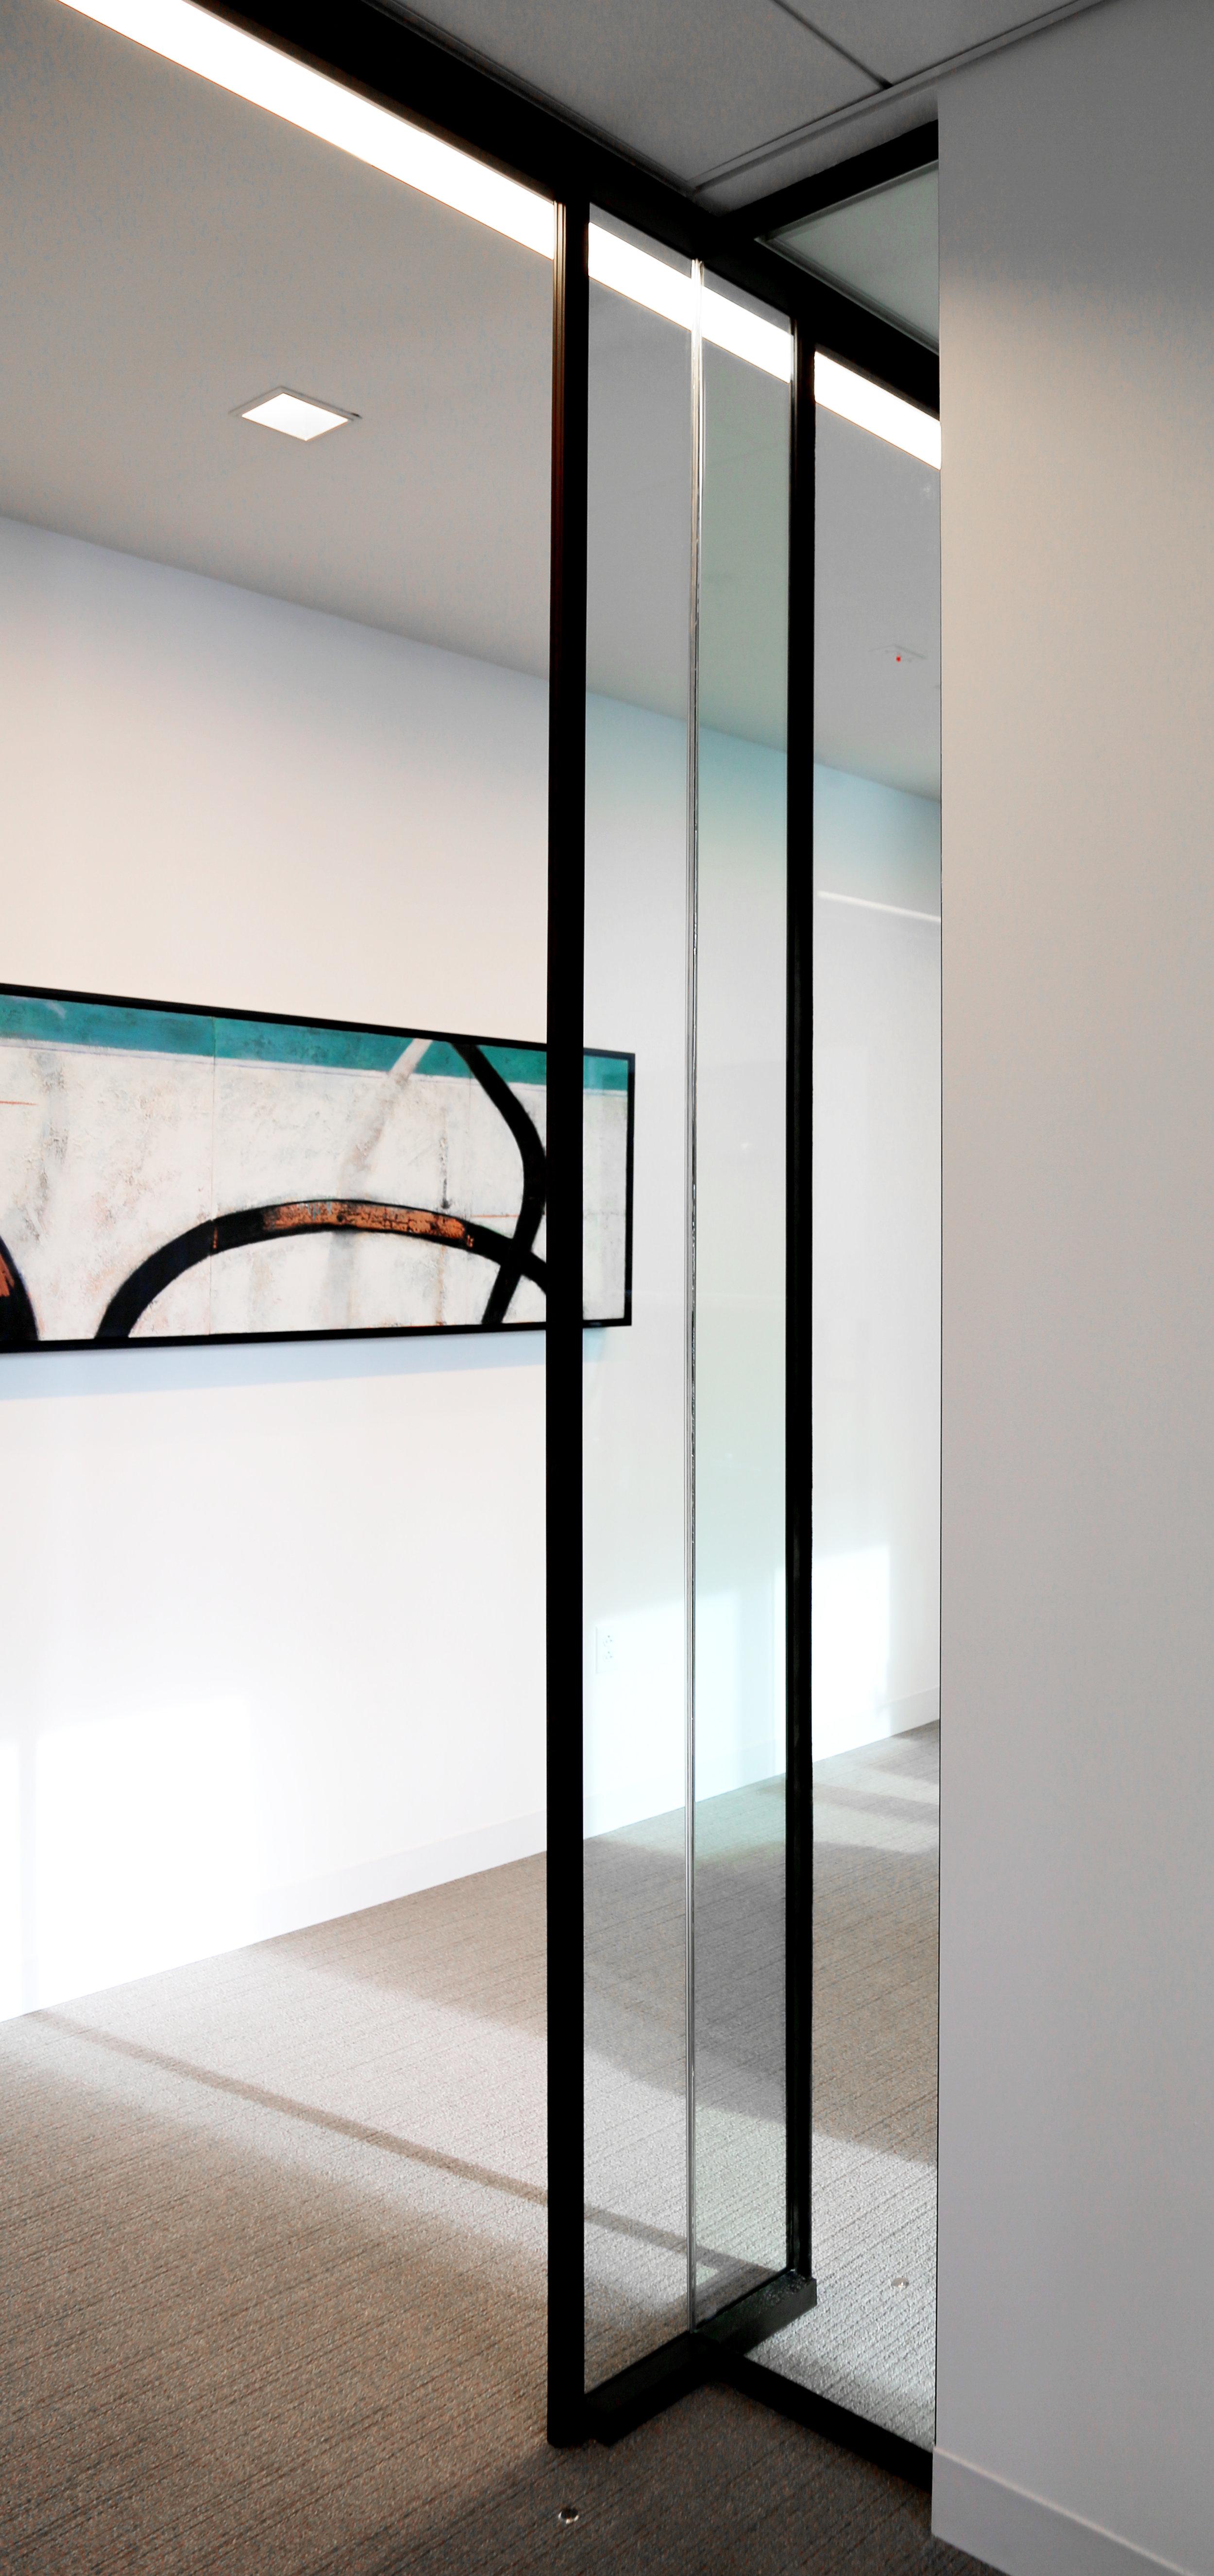 Modernus Aluminum Framed System Glass Return - Spaceworks AI.jpg